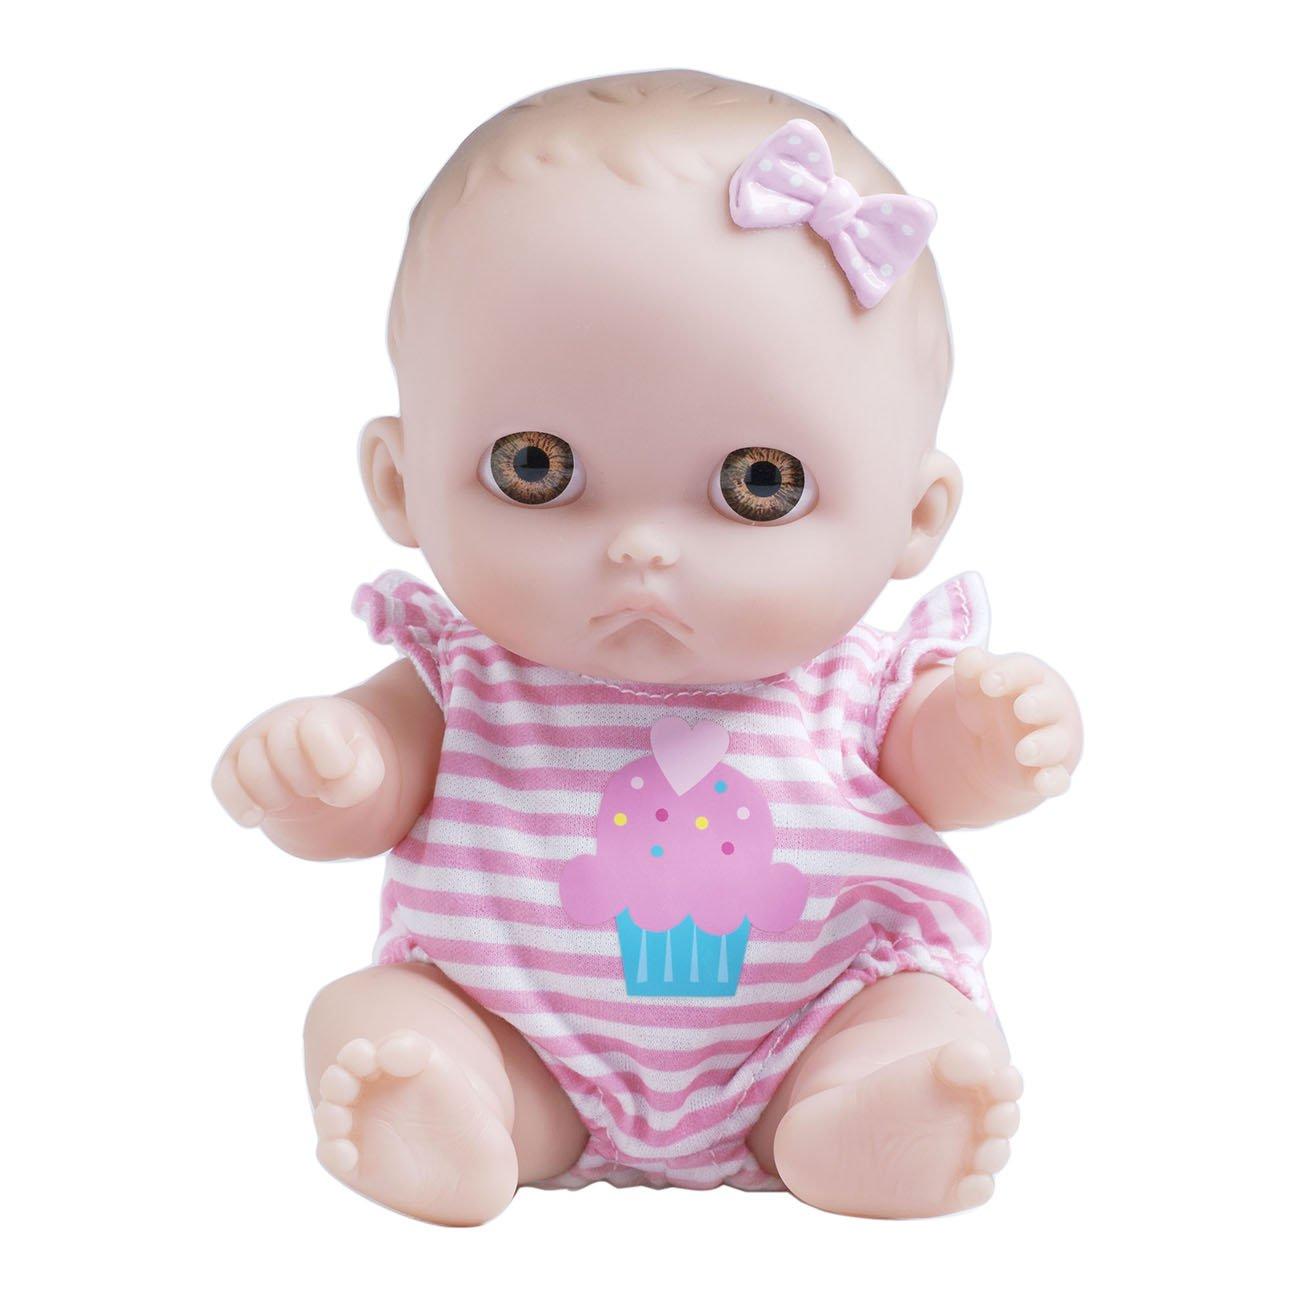 JC TOYS 16936 - Puppe 22 cm Lil Cutesies